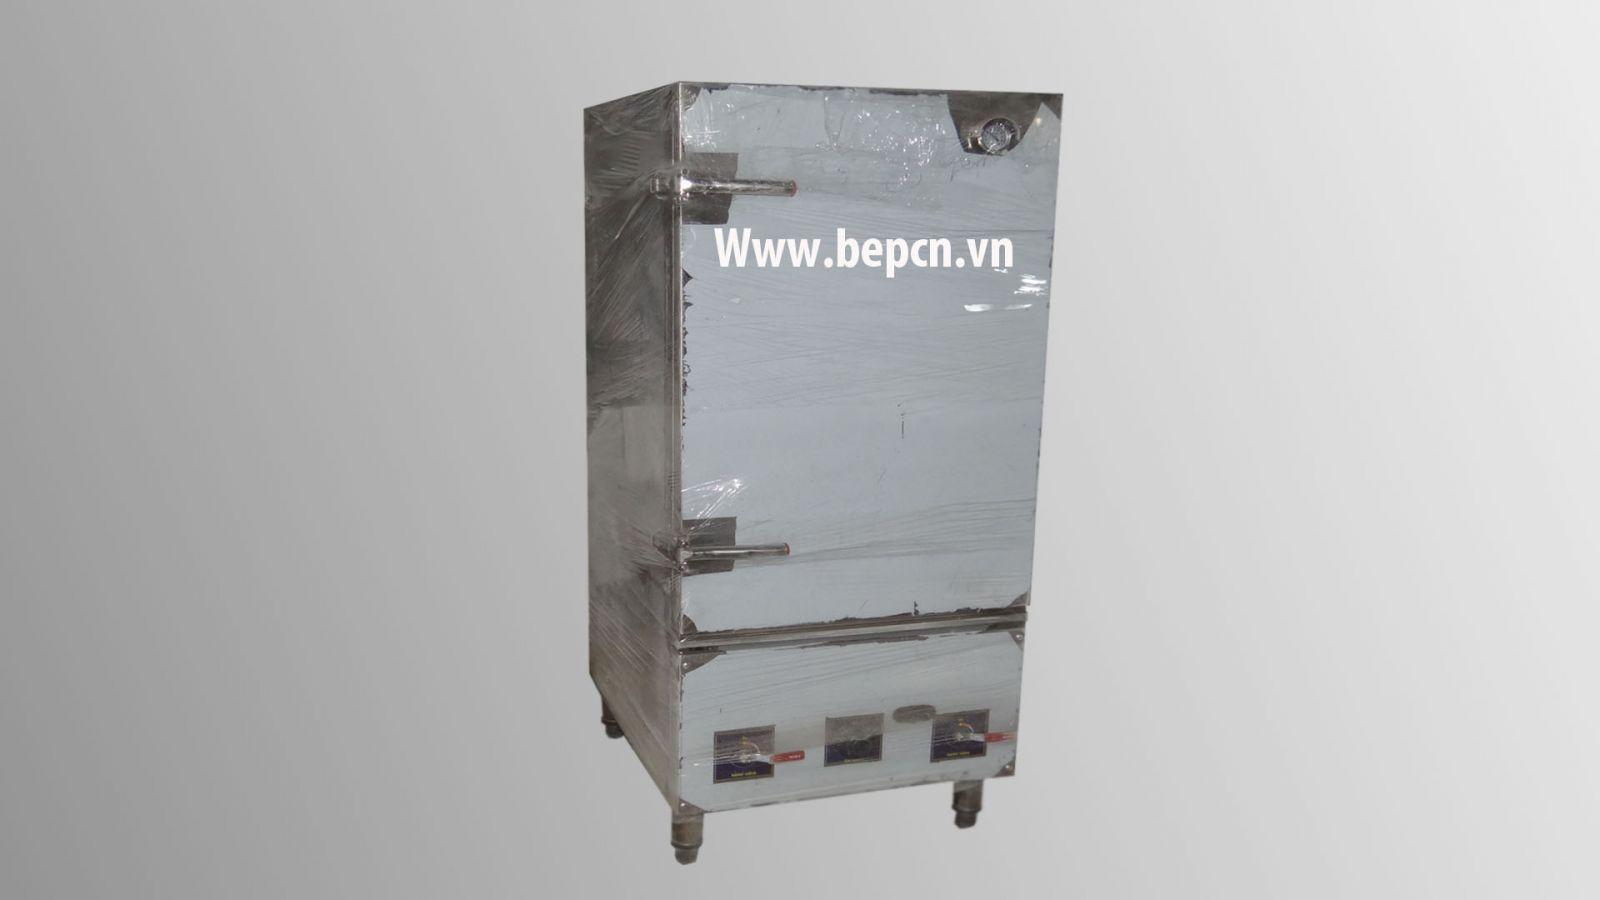 Tủ cơm công nghiệp 40kg Model SCTC - DG40